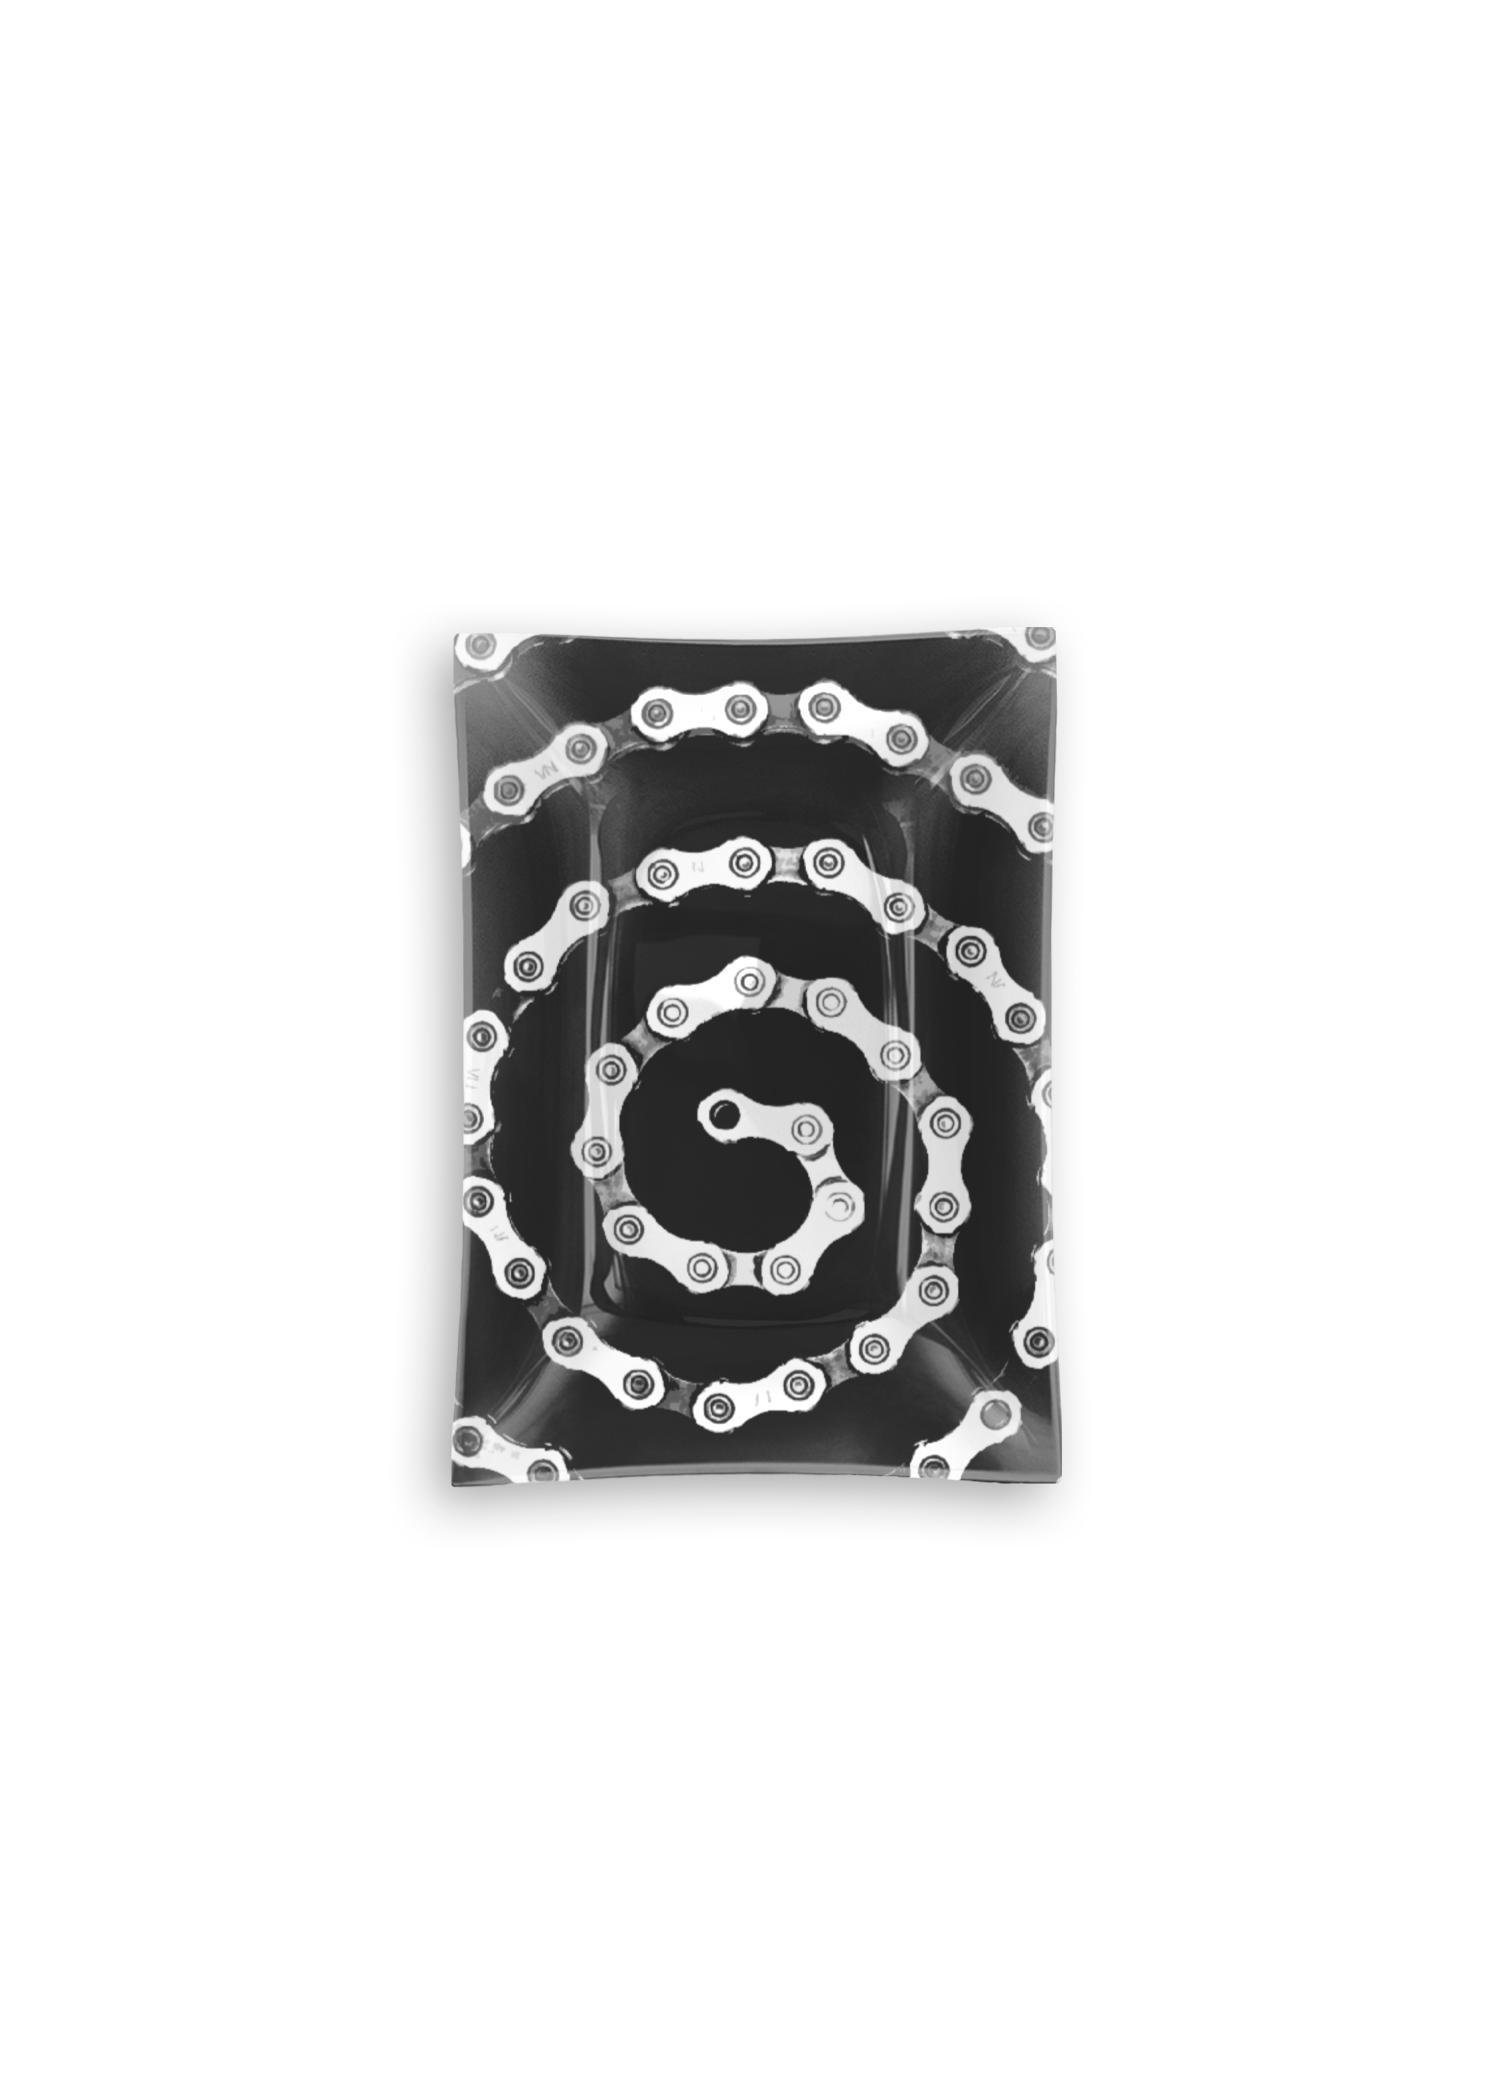 VIDA Oblong Glass Tray - Bike Chain Spiral by VIDA Original Artist  - Size: Small